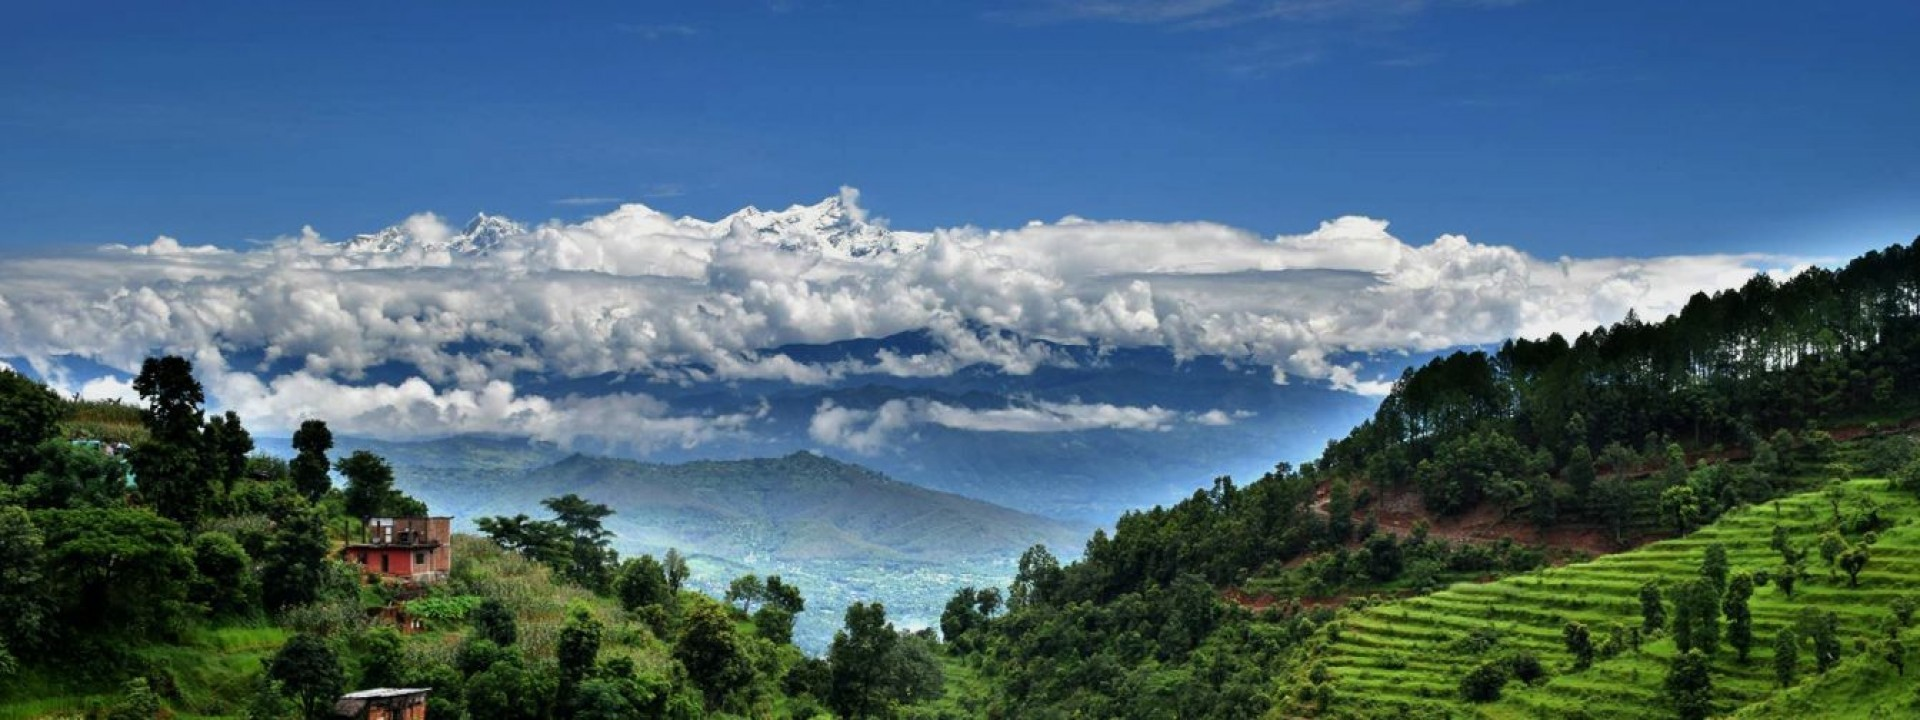 Bandipur- Riepe Homestay Tour